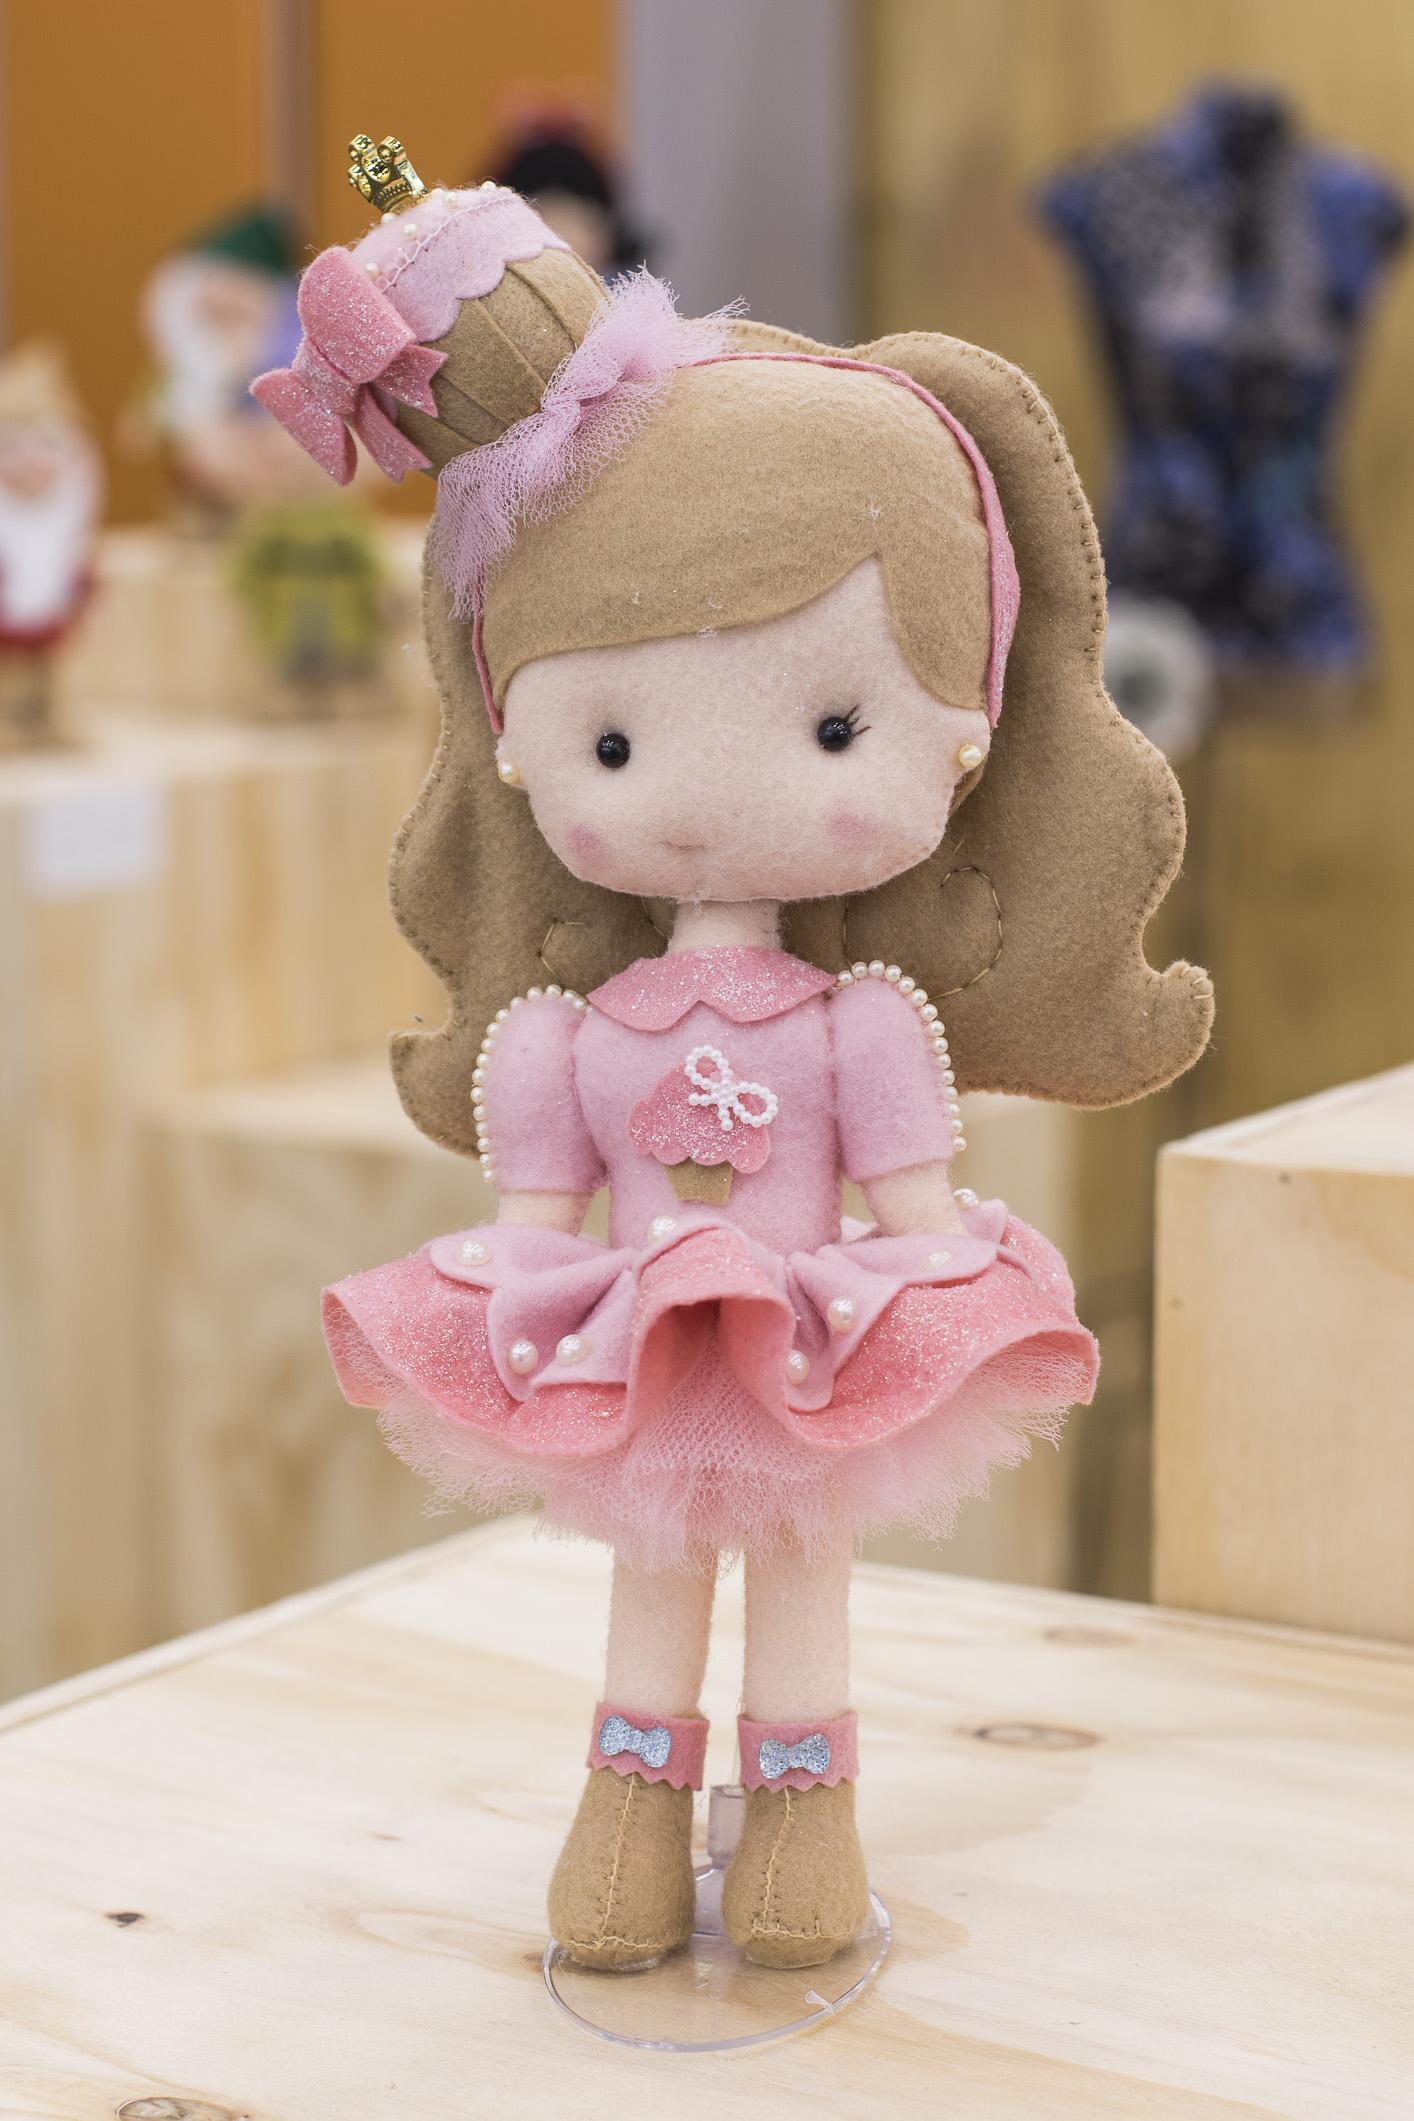 Boneca Glamour, de Juliana Cwikla